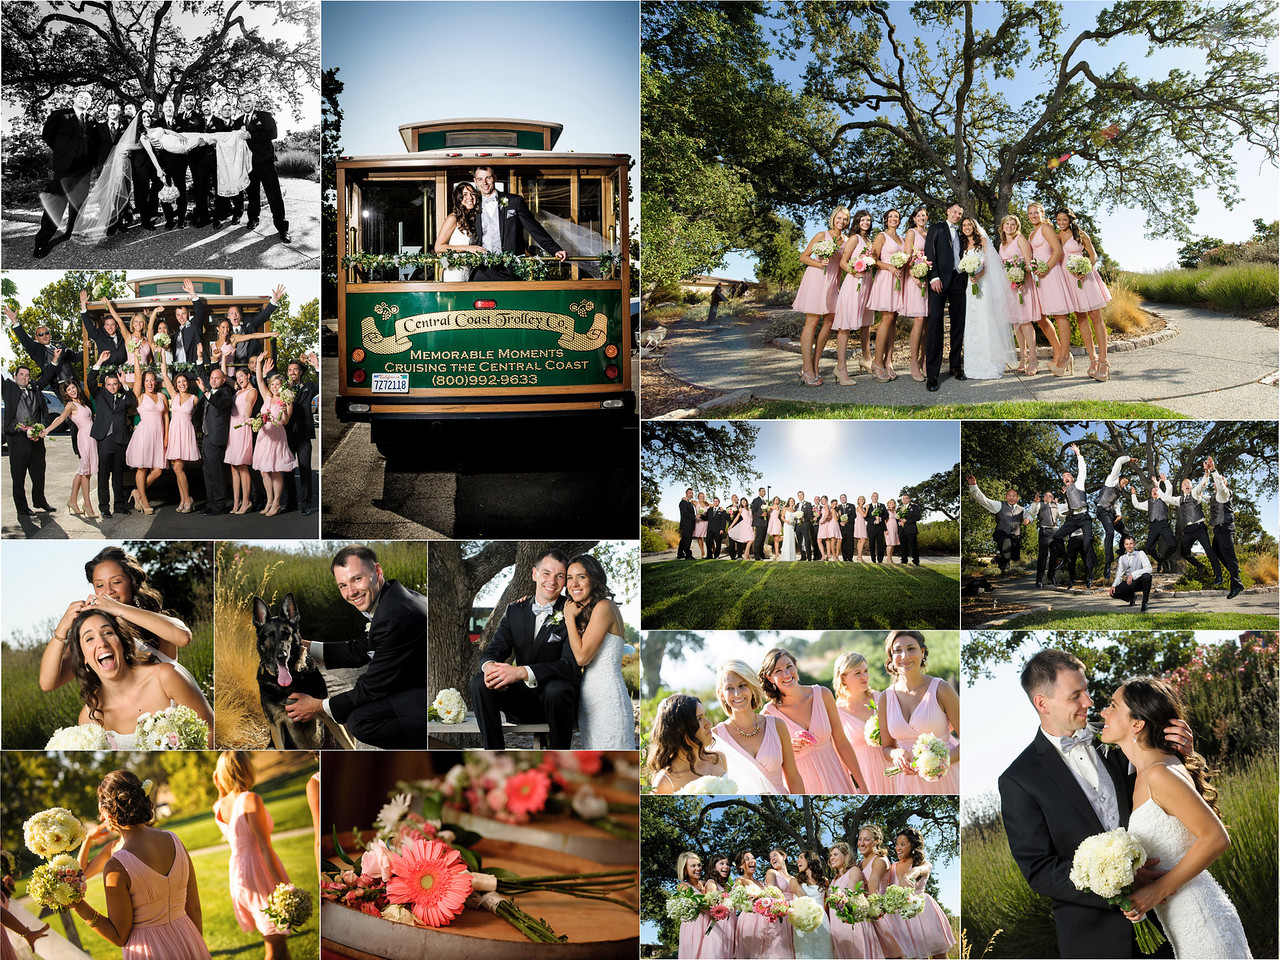 Jenny_and_Dimitriy_Wedding_Photography_4x6_Photo_Board_05